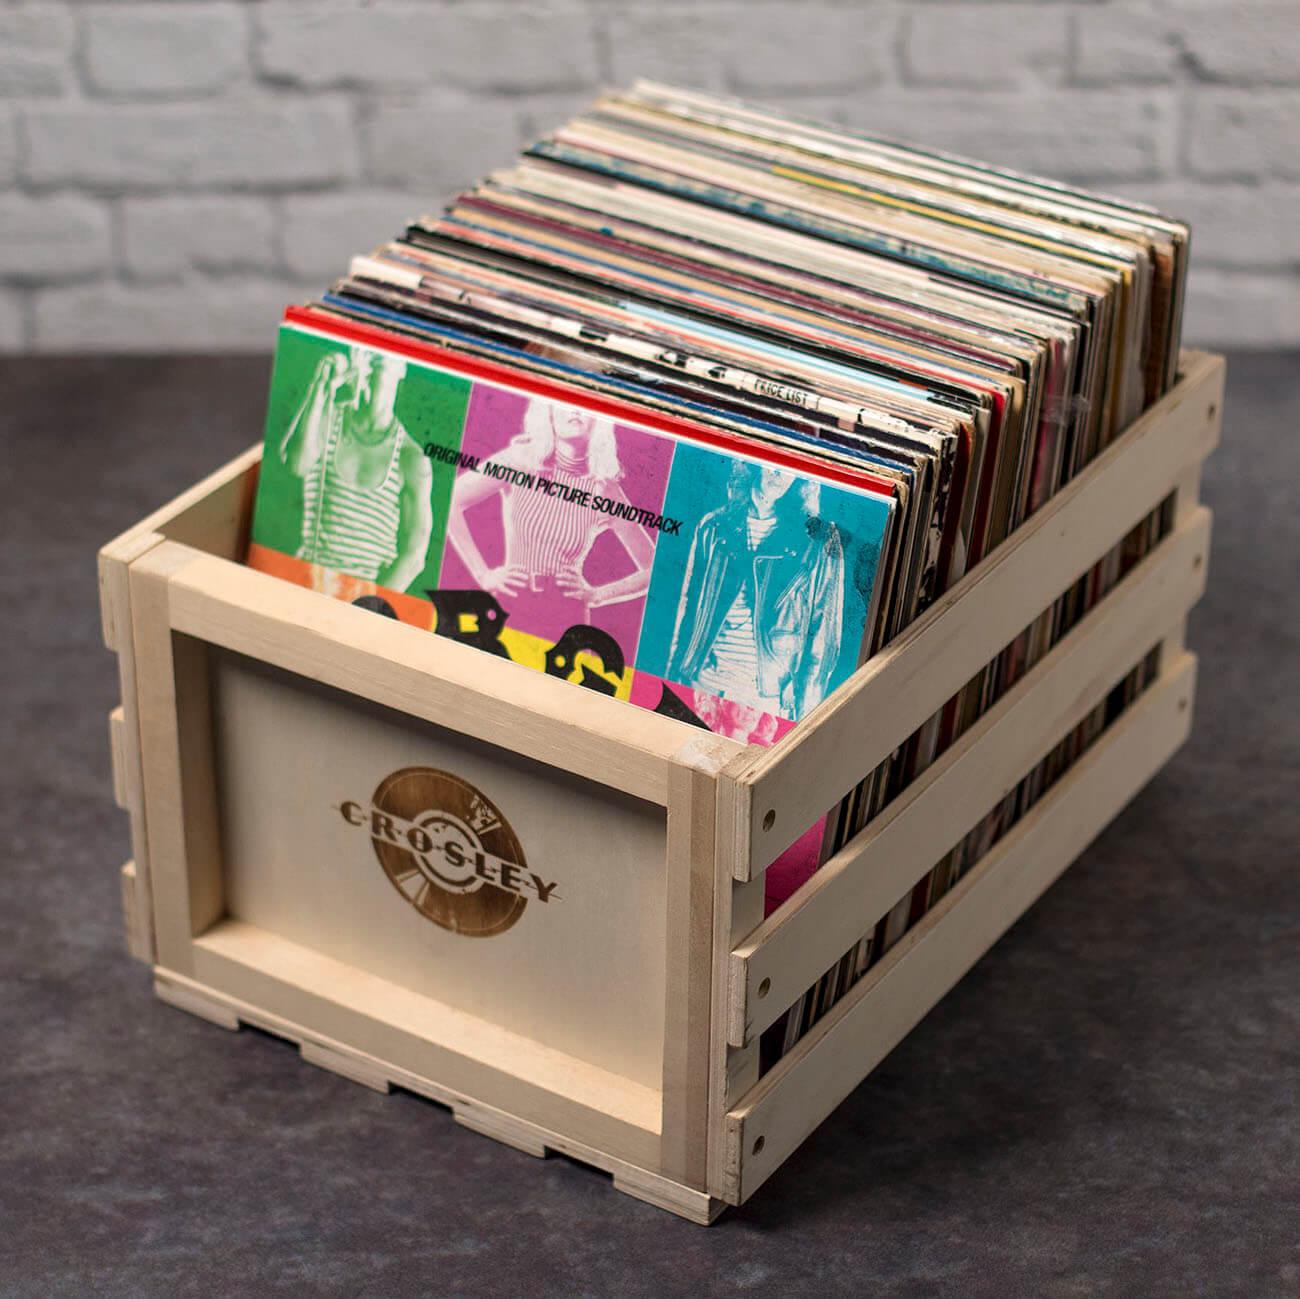 Crosley Wooden Record Storage Crate